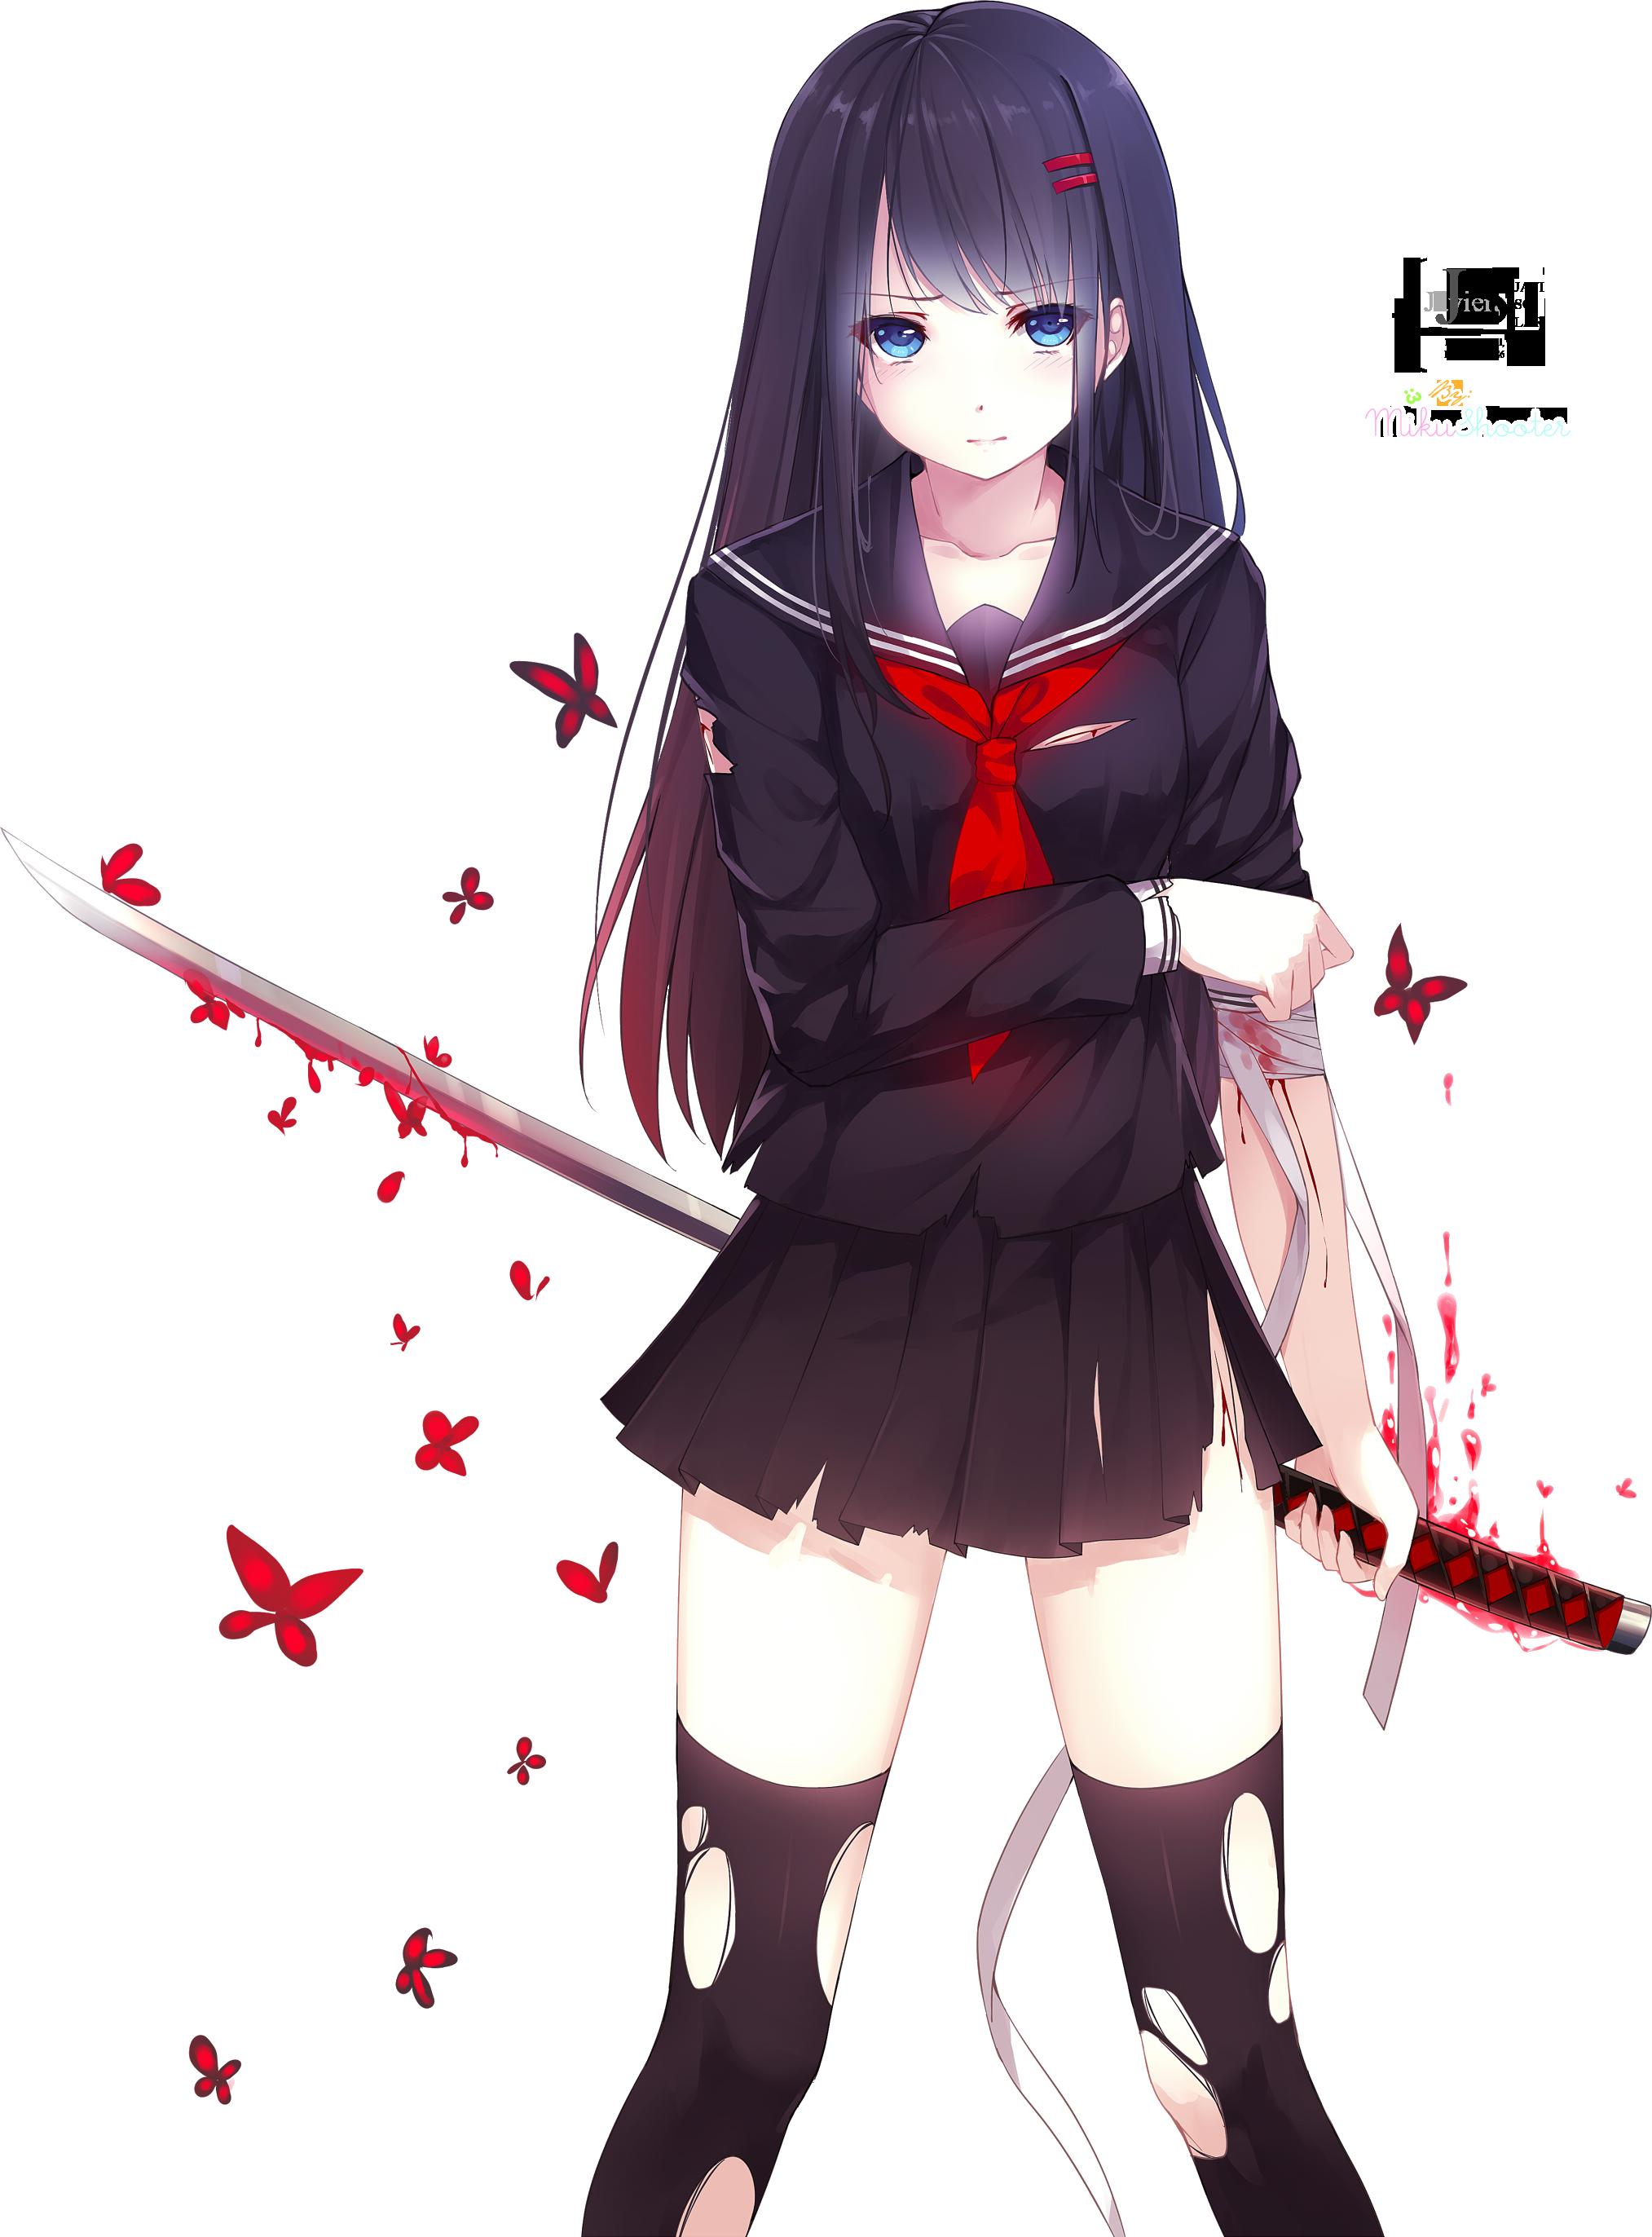 Download Free Anime Girl ICON favicon  FreePNGImg